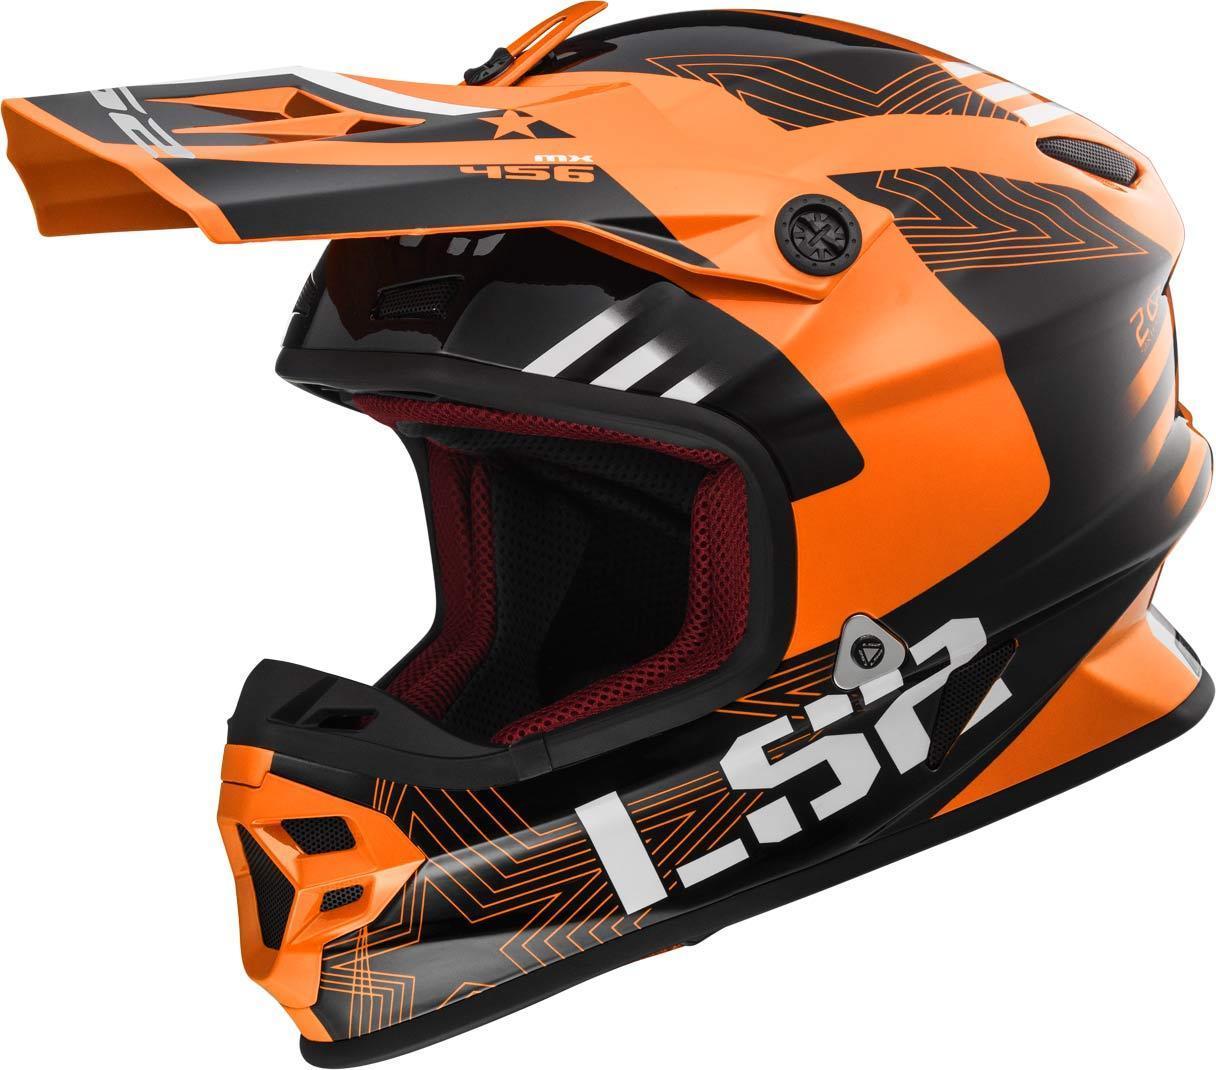 LS2 MX456 Light Evo Rallie Motocross Helm, orange, Größe S, orange, Größe S